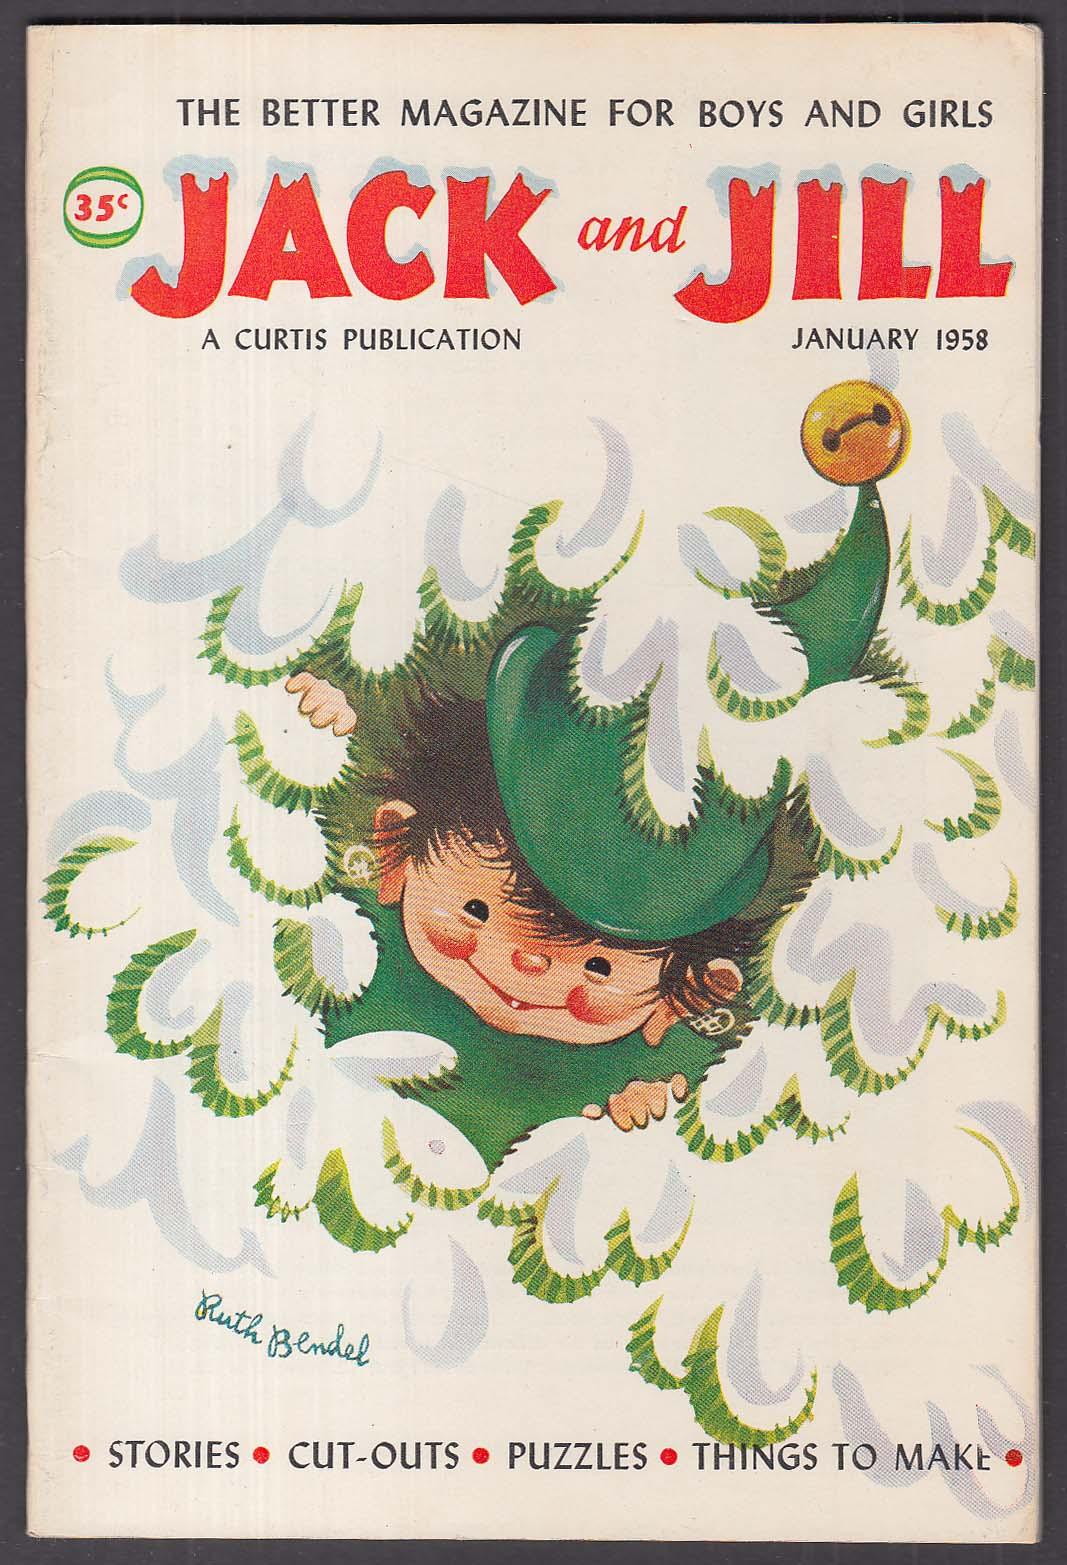 JACK & JILL Ruth Bendel Margot Austin Milt Groth + 1 1958